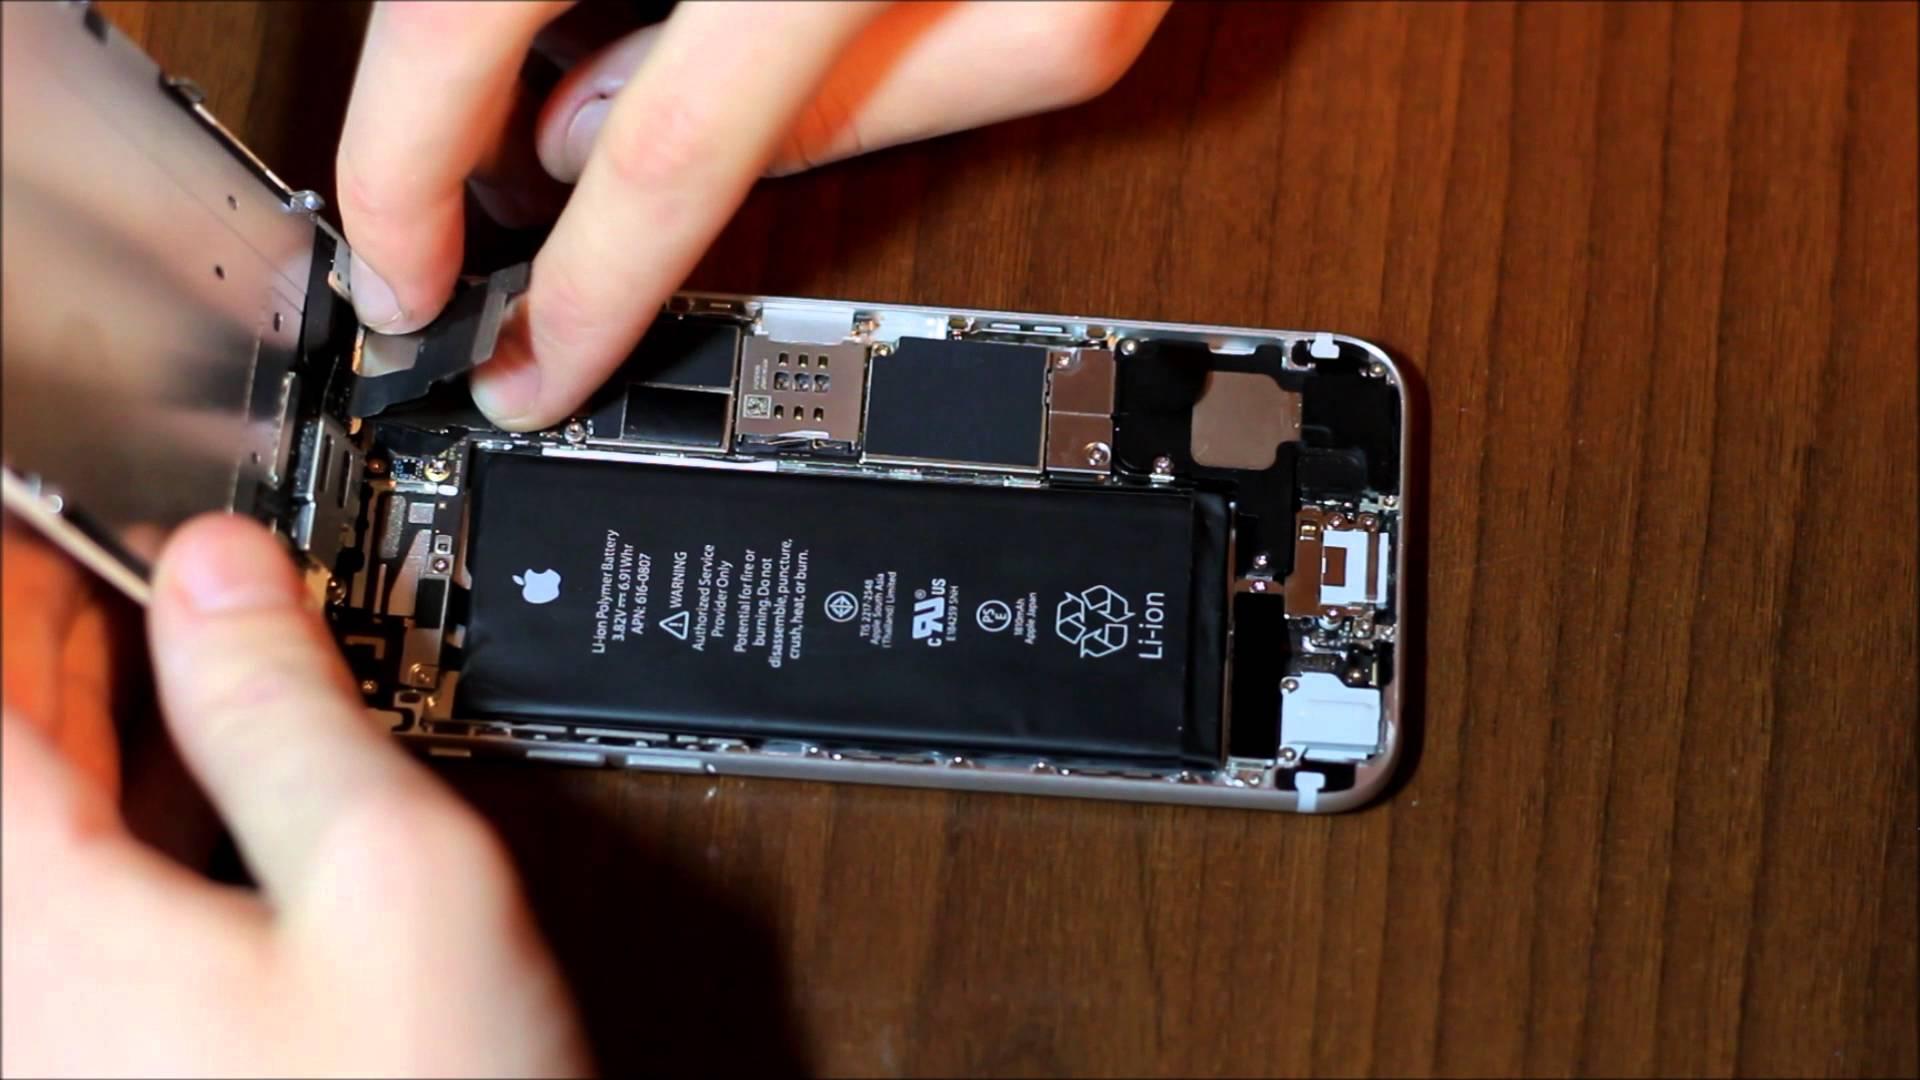 Типичные неисправности iPhone